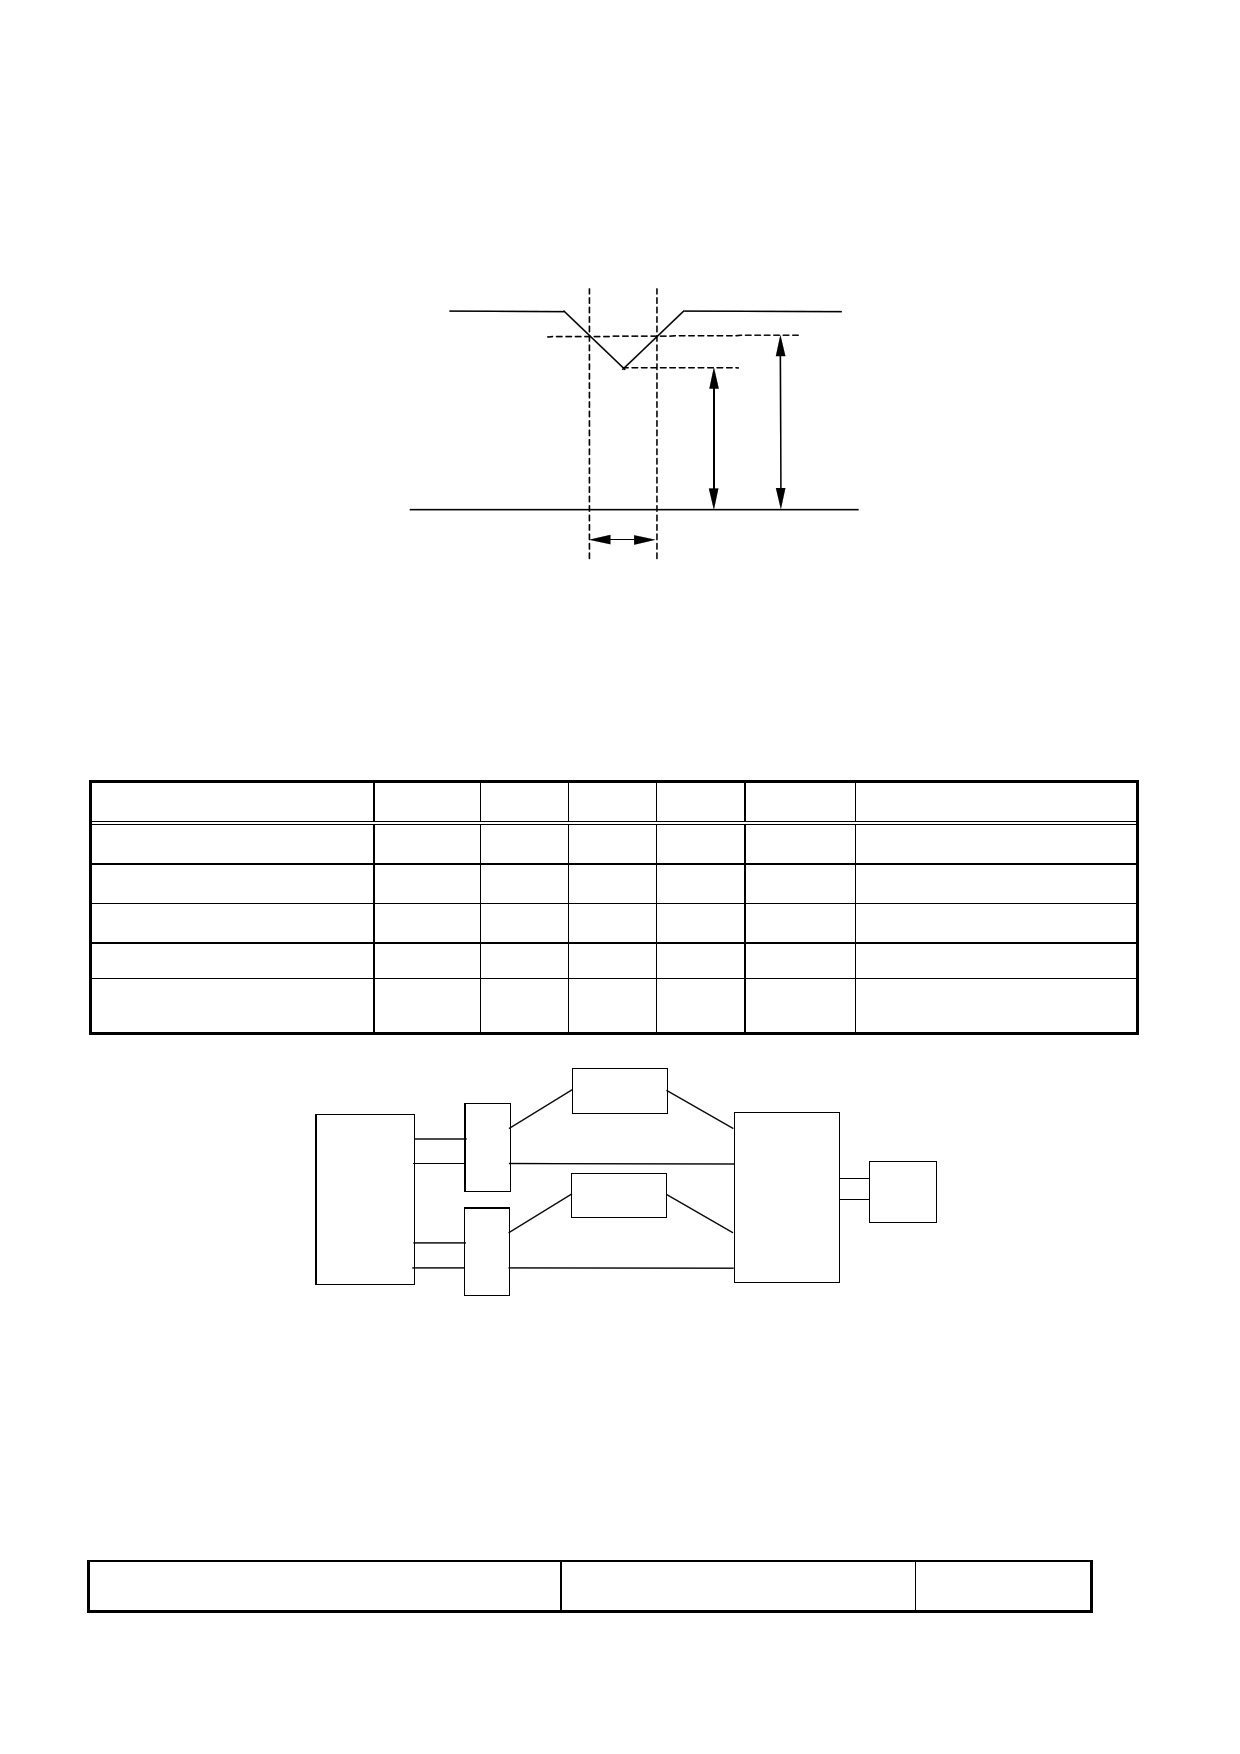 T-51638D084J-FW-A-AC pdf